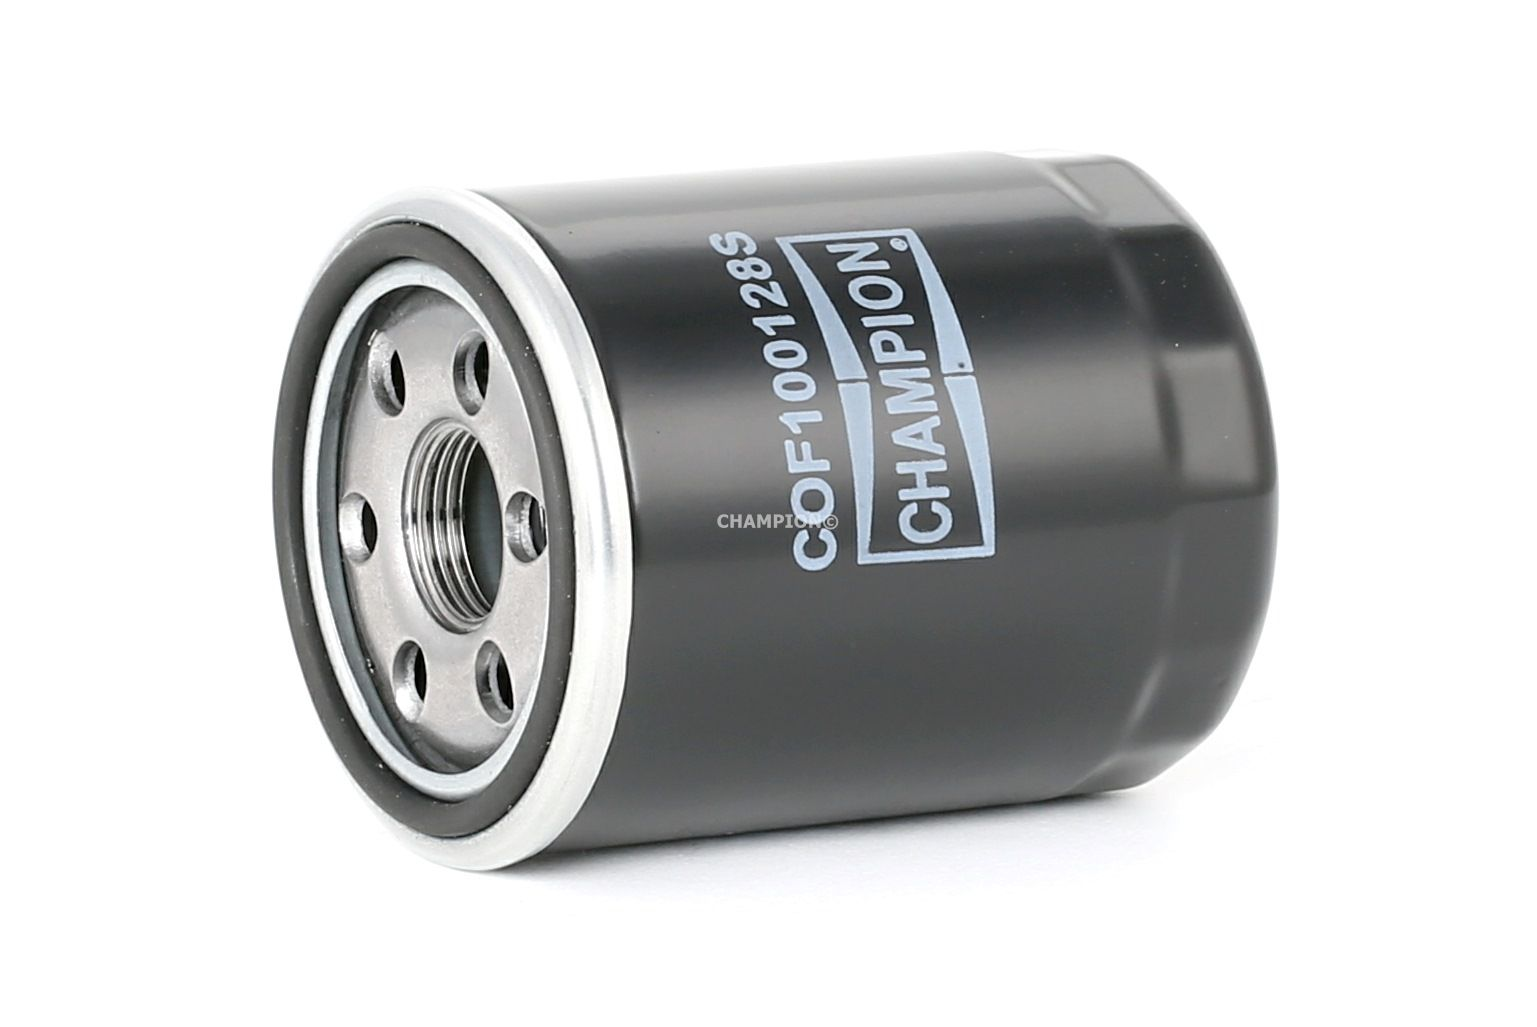 MAZDA XEDOS 1995 Ölfilter - Original CHAMPION COF100128S Innendurchmesser: 53mm, Innendurchmesser 2: 60mm, Ø: 67mm, Höhe: 85mm, Höhe 1: 59mm